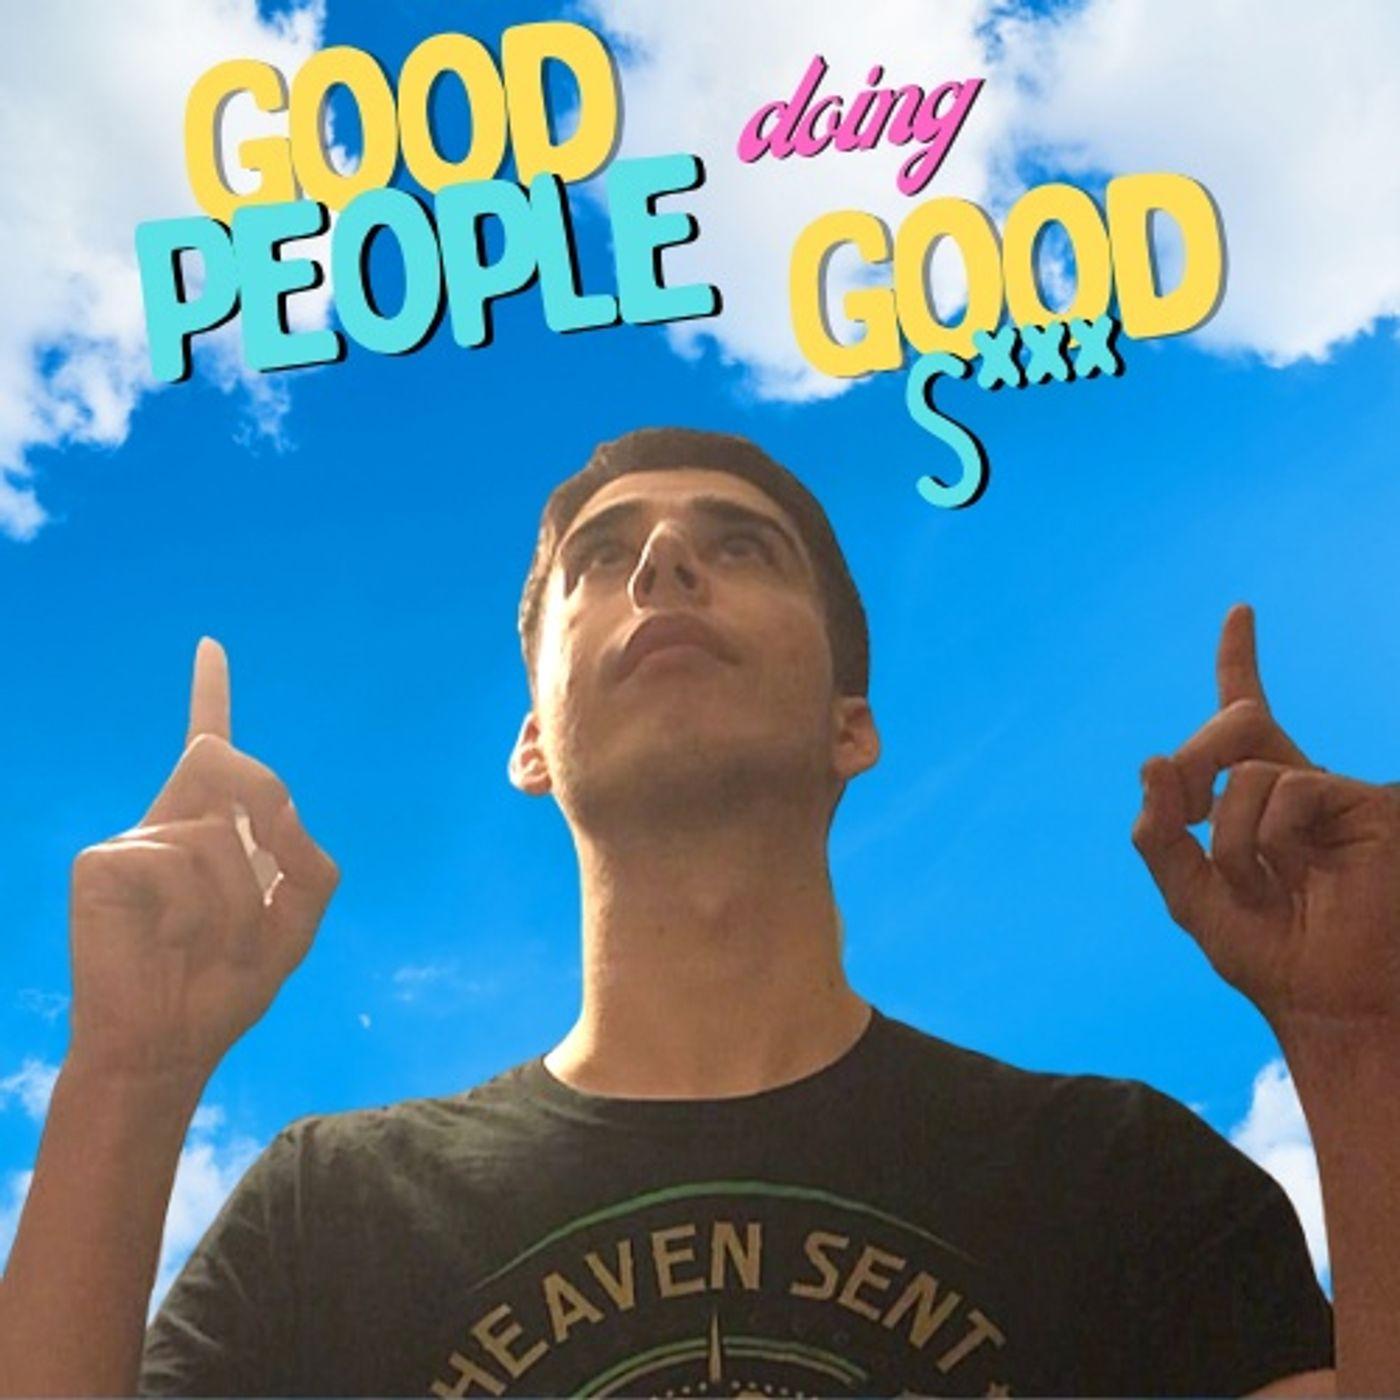 Good People Doing Good S*** - Josh Robinson